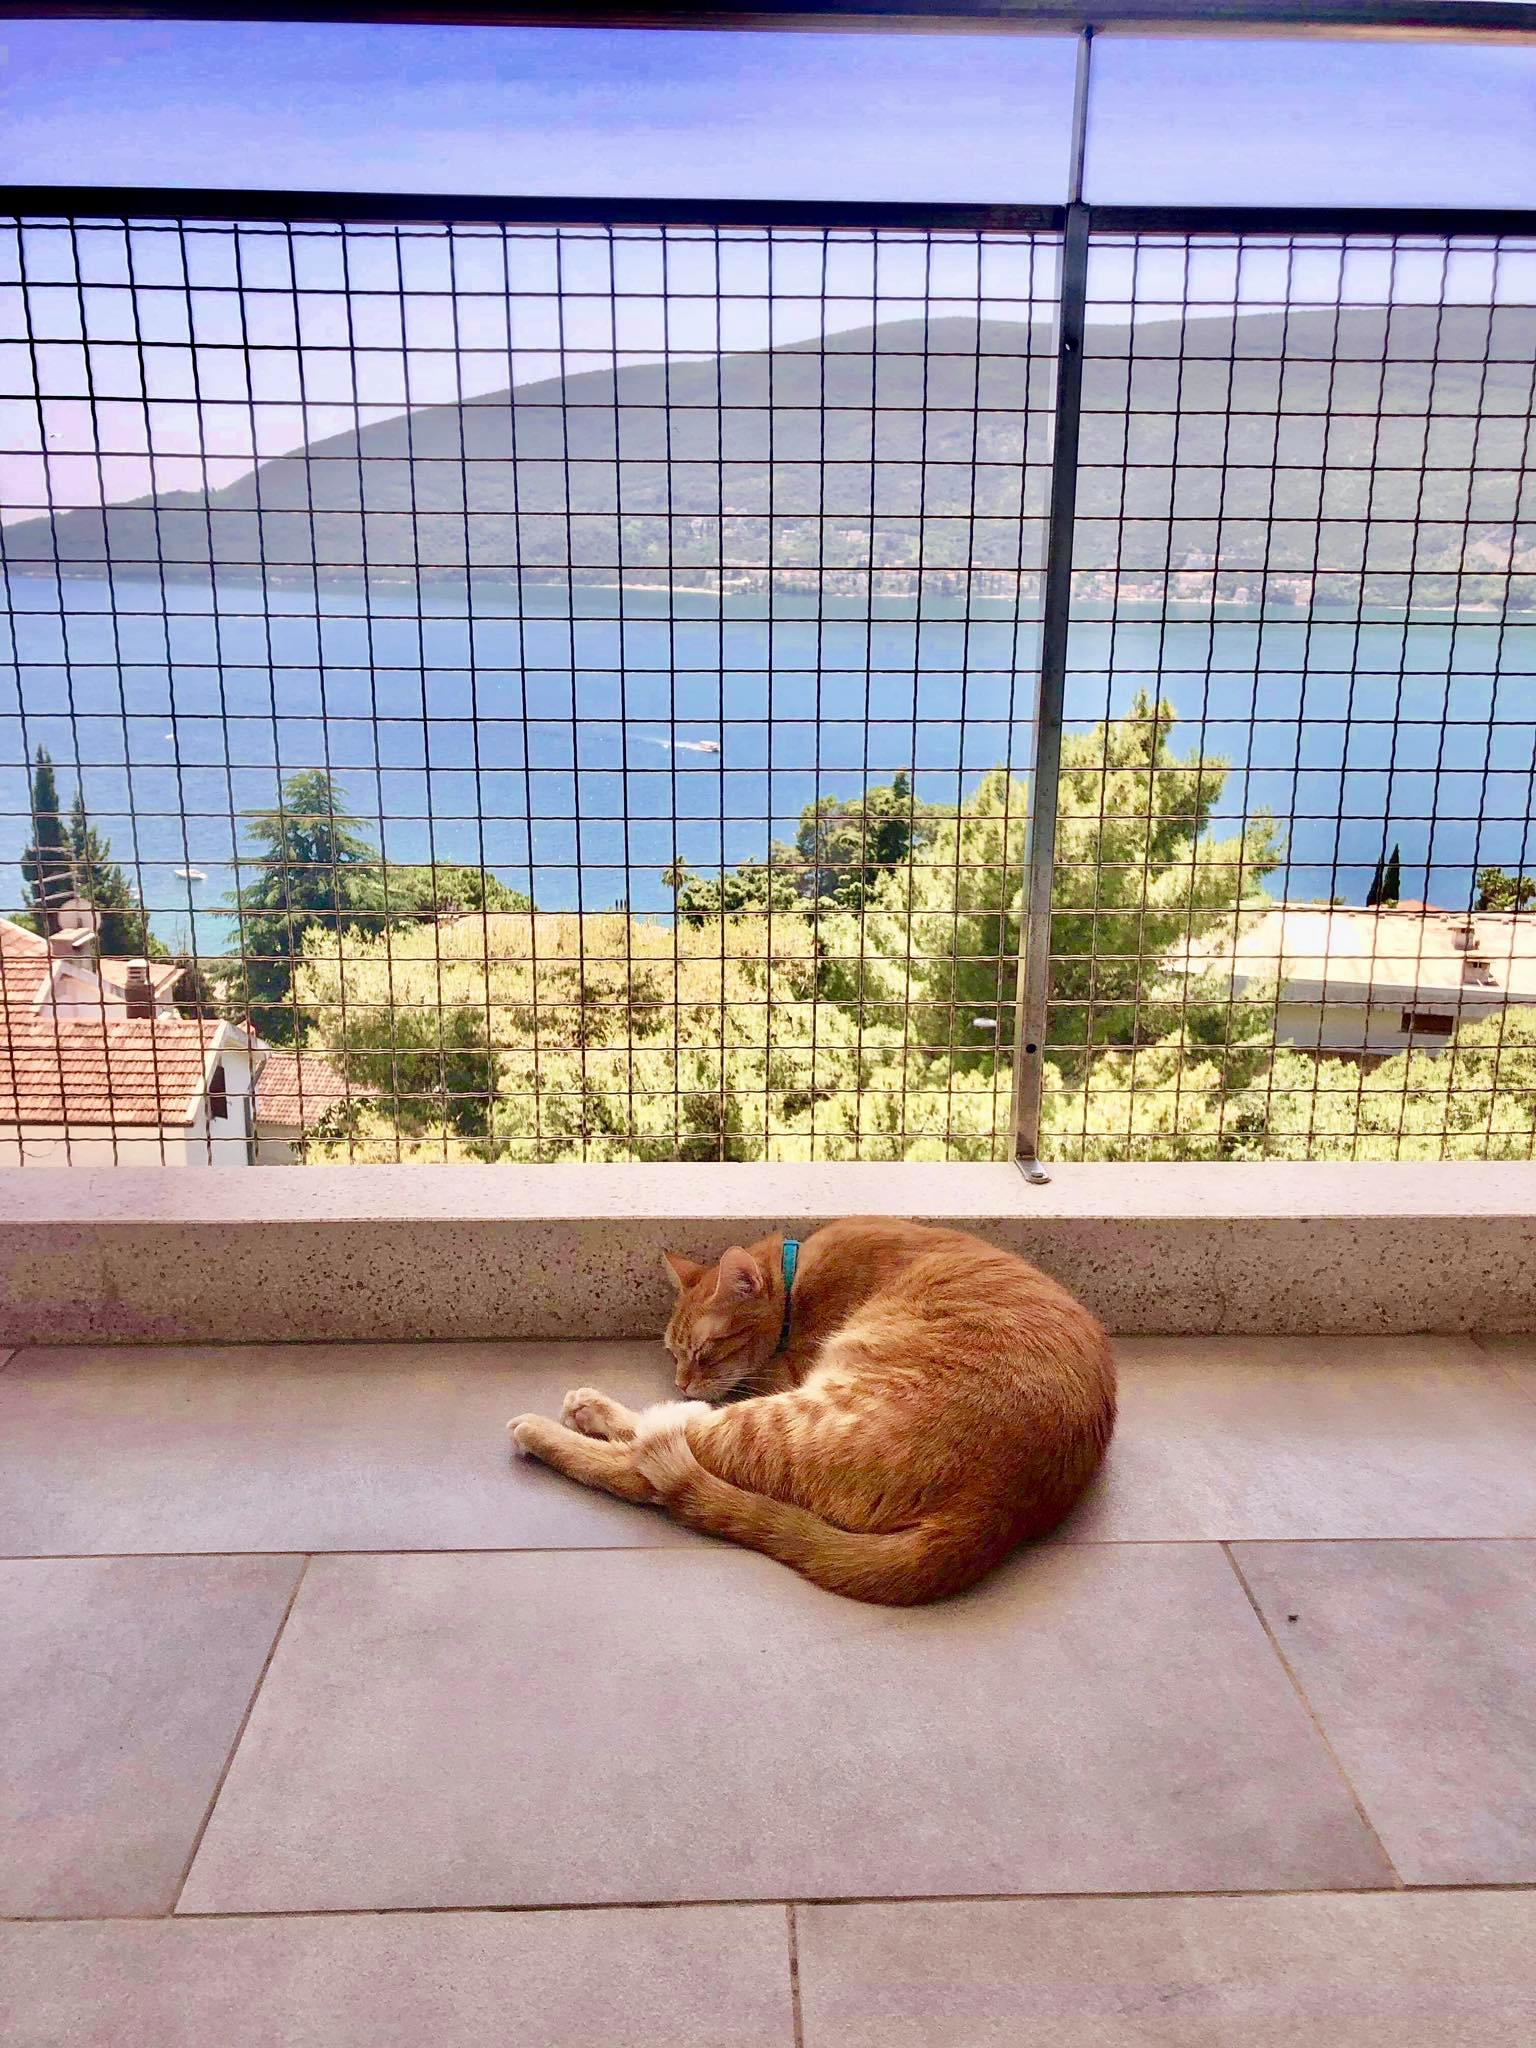 Expat Life in Montenegro Day 27 Captain Ahab & Little Zissou in Montenegro1.jpg